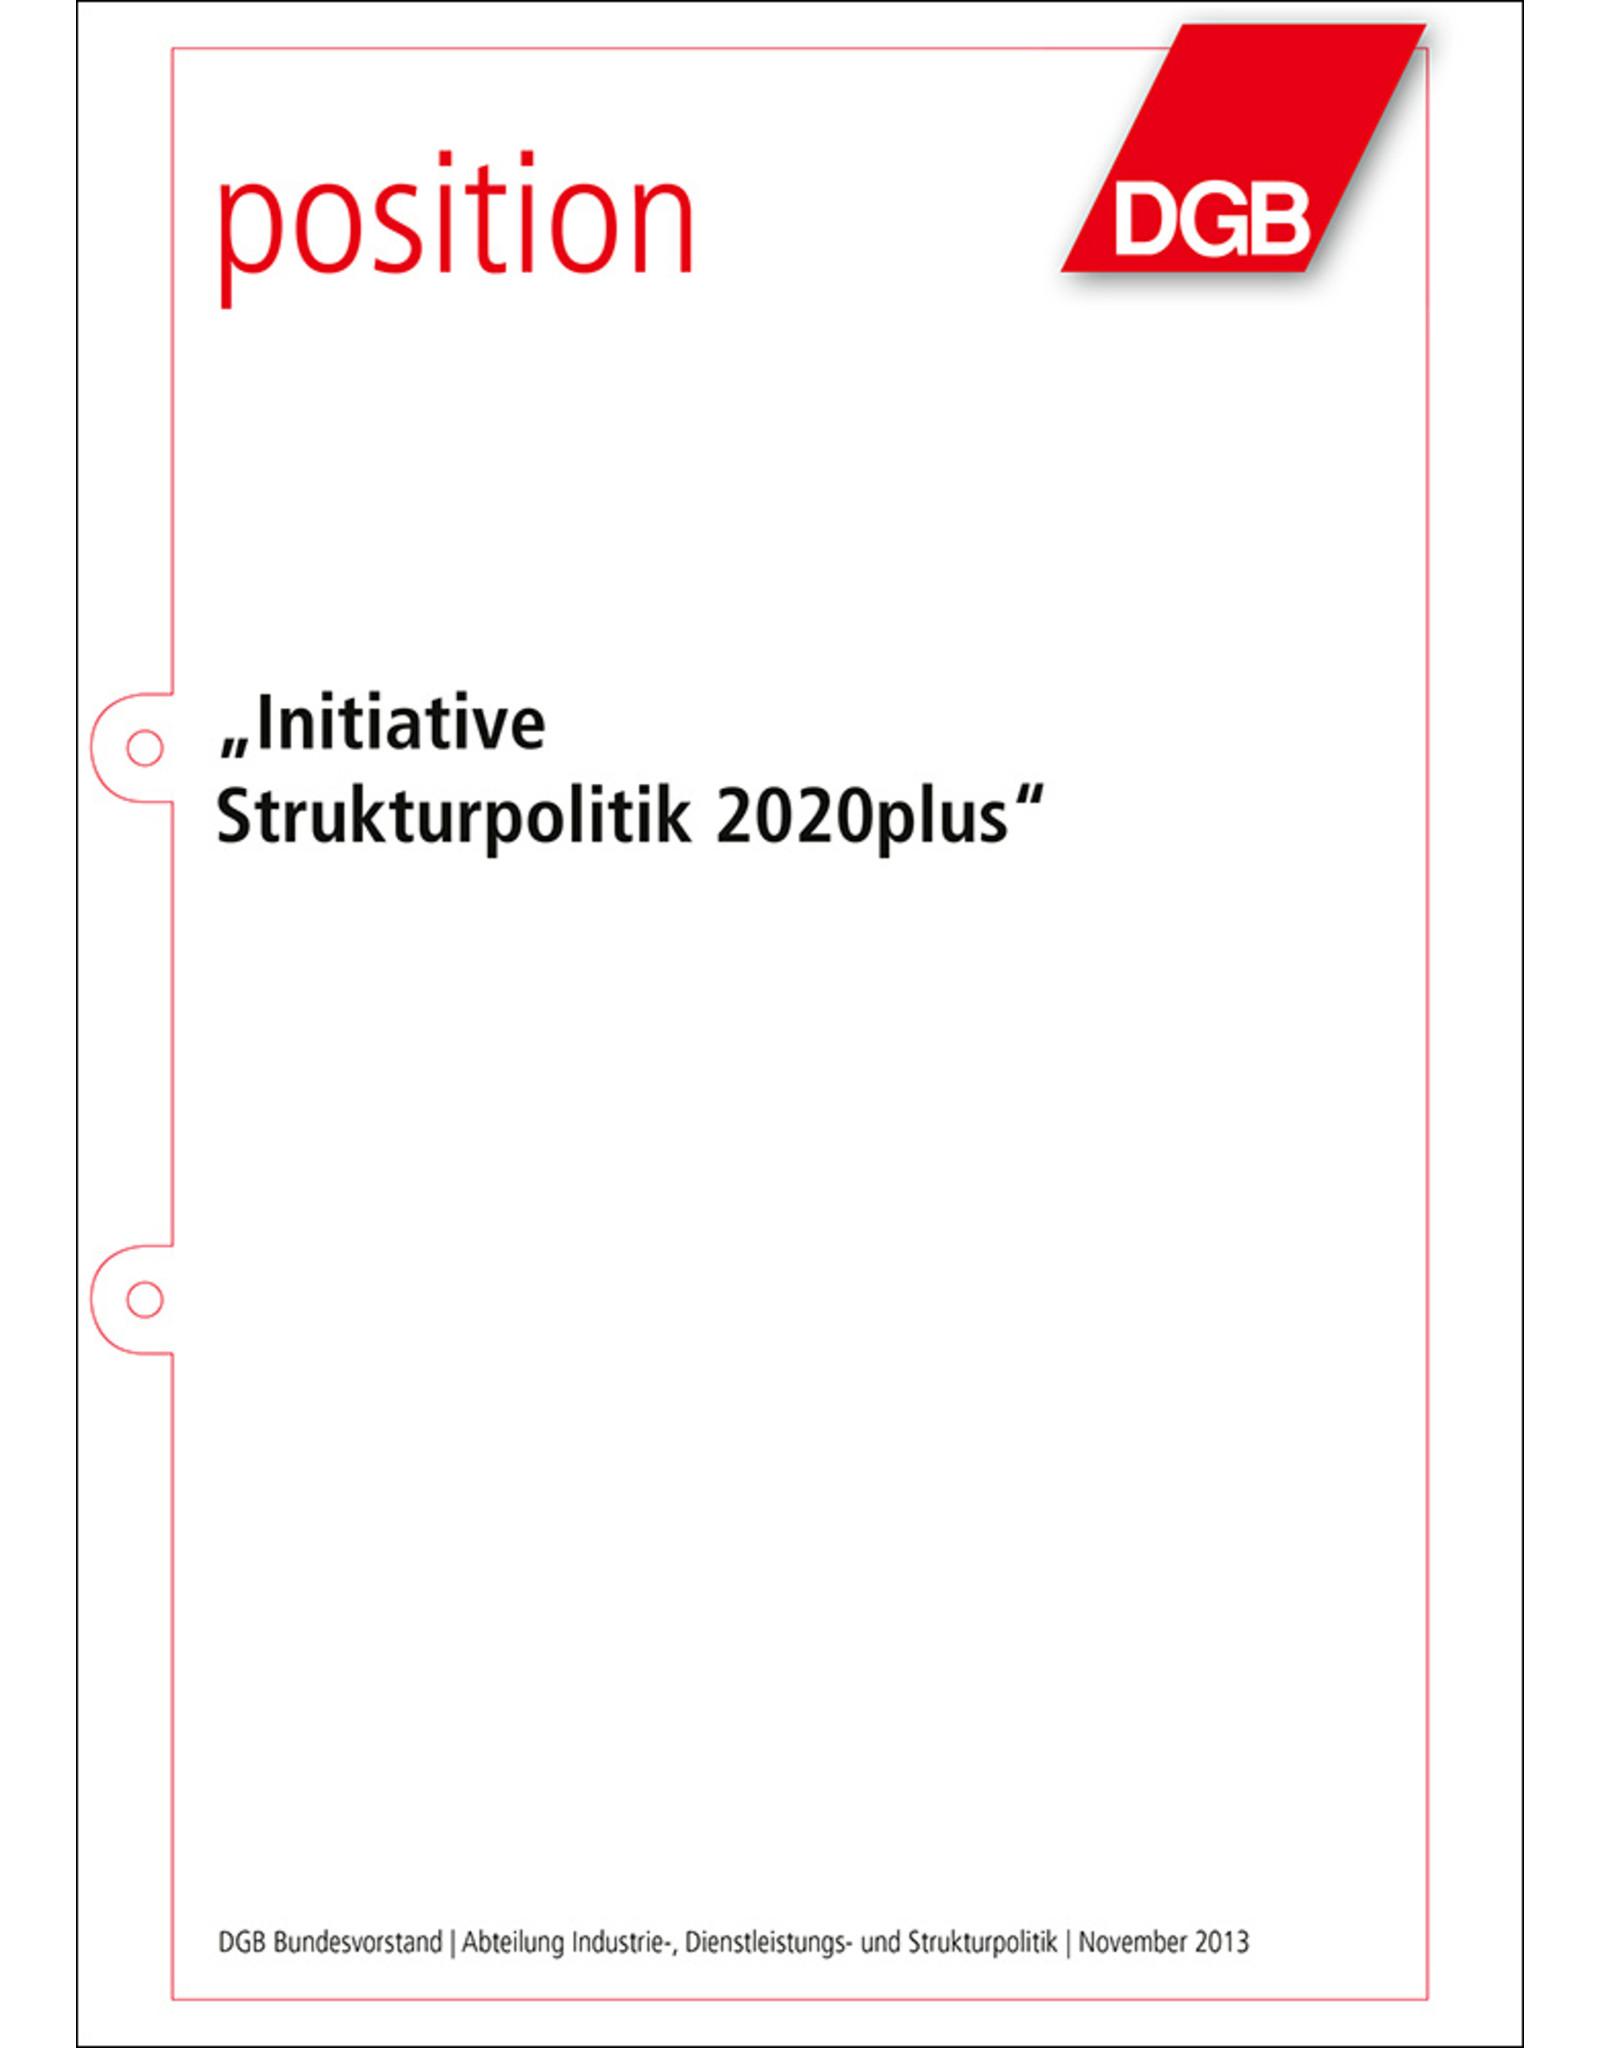 DGB-Broschüre Initiative  Strukturpolitik 2020plus 52 Seiten